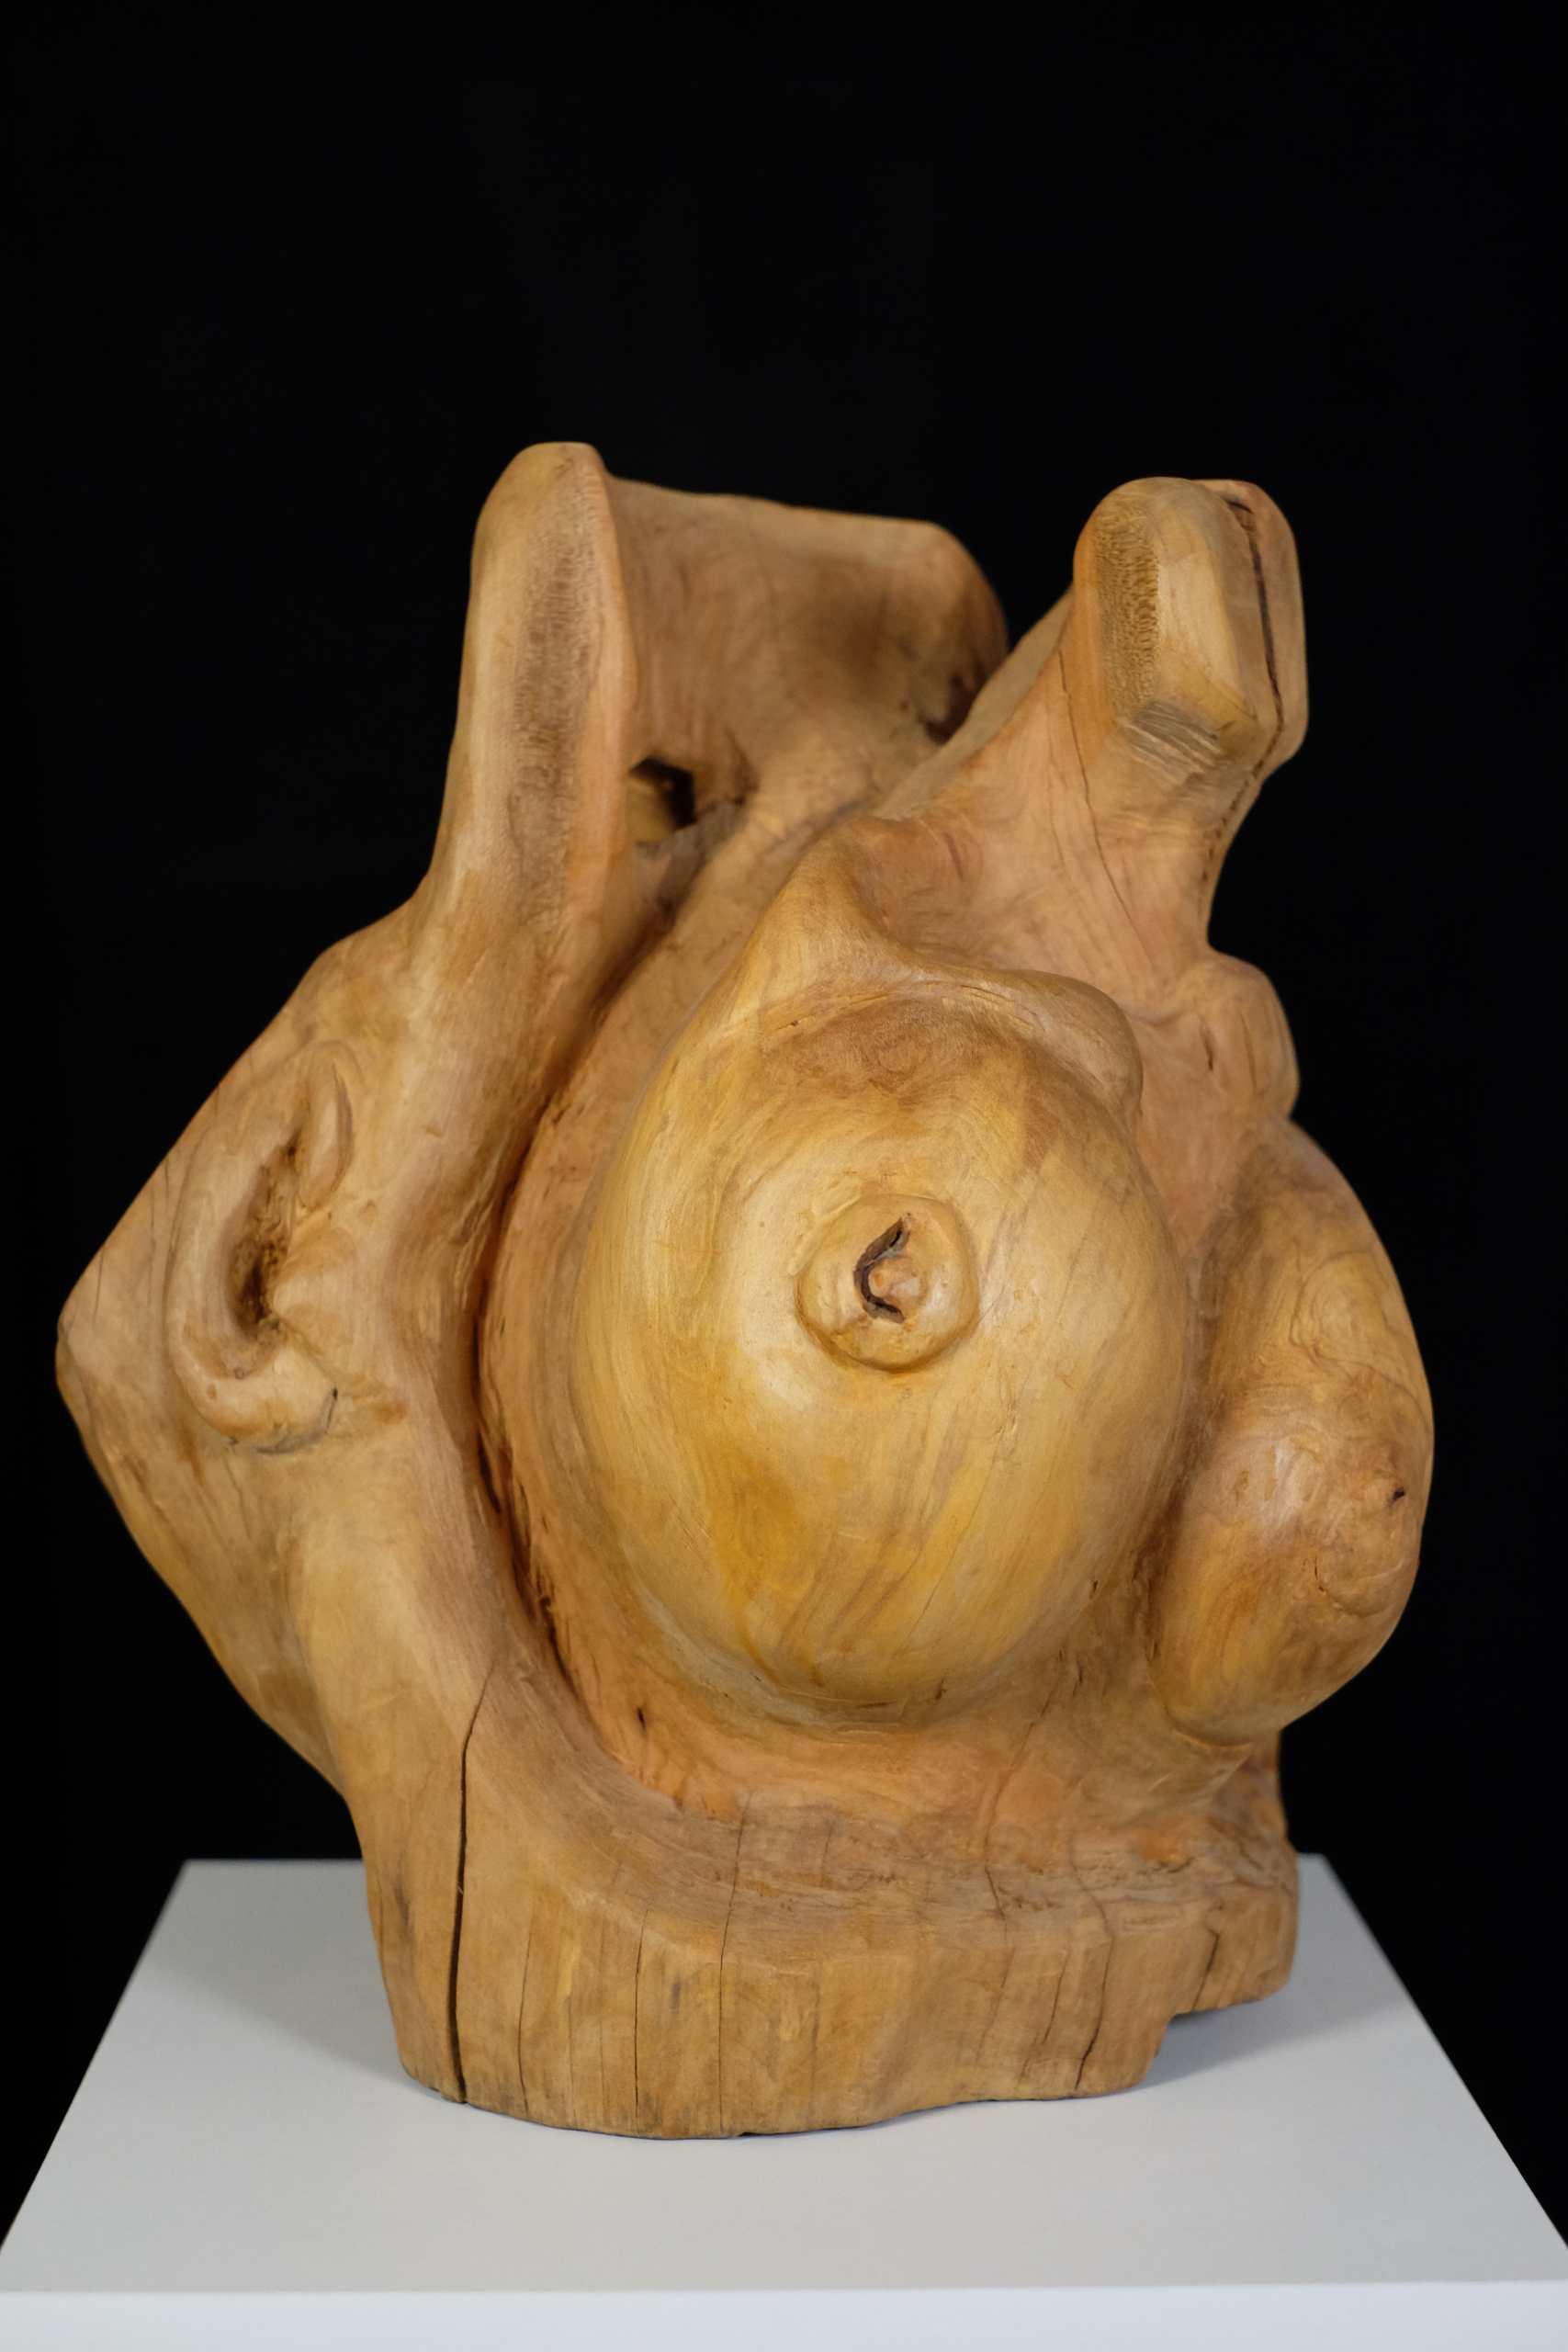 Apfelholz Skulptur Eva von Murat Taskin